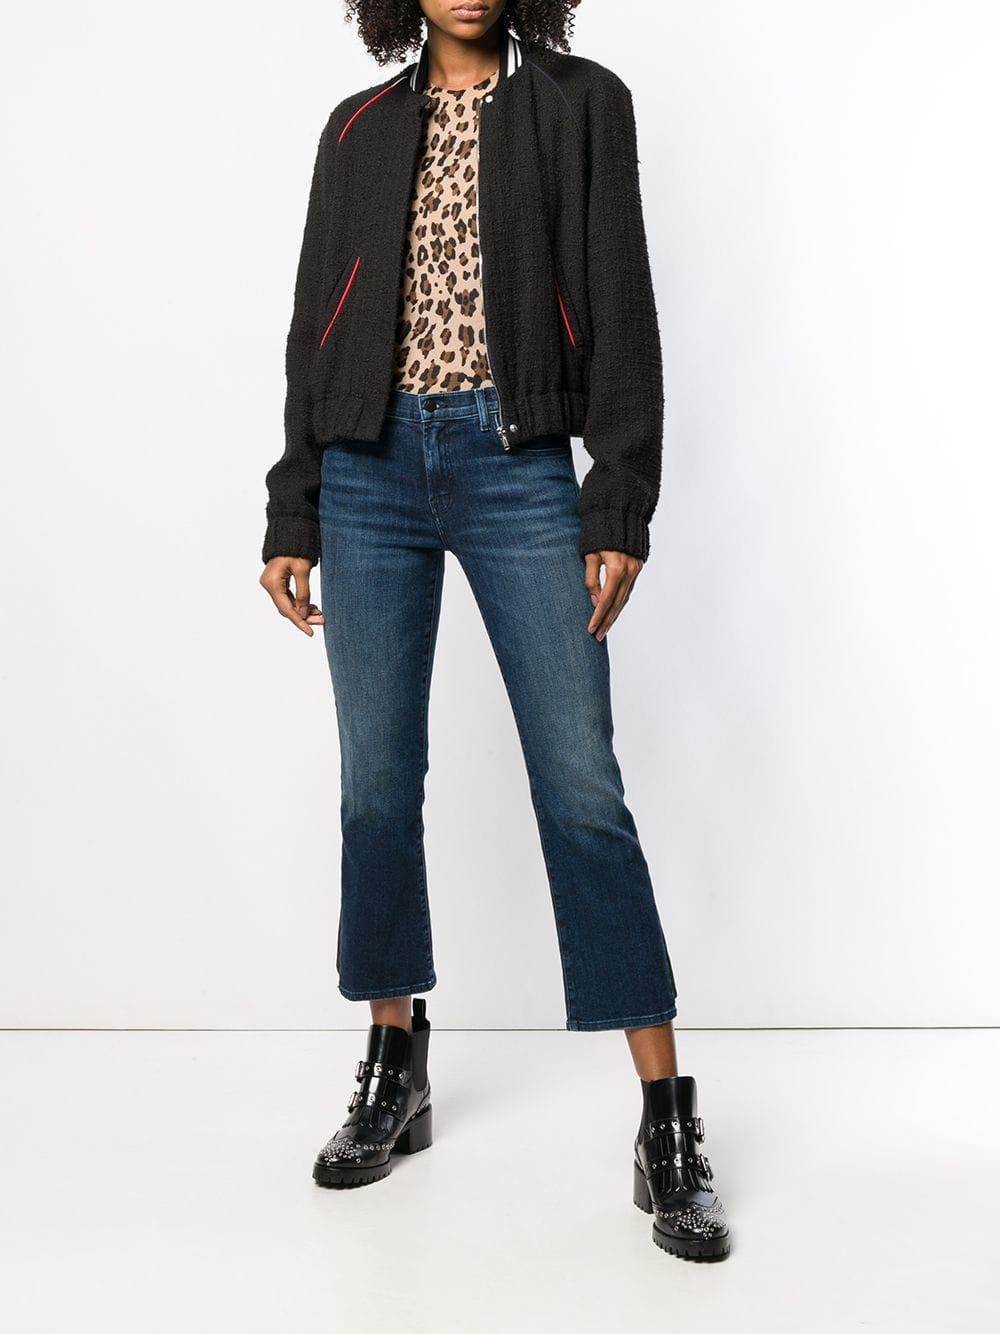 J Classic Jeans Lyst In Blue Cropped Brand iukOZPX